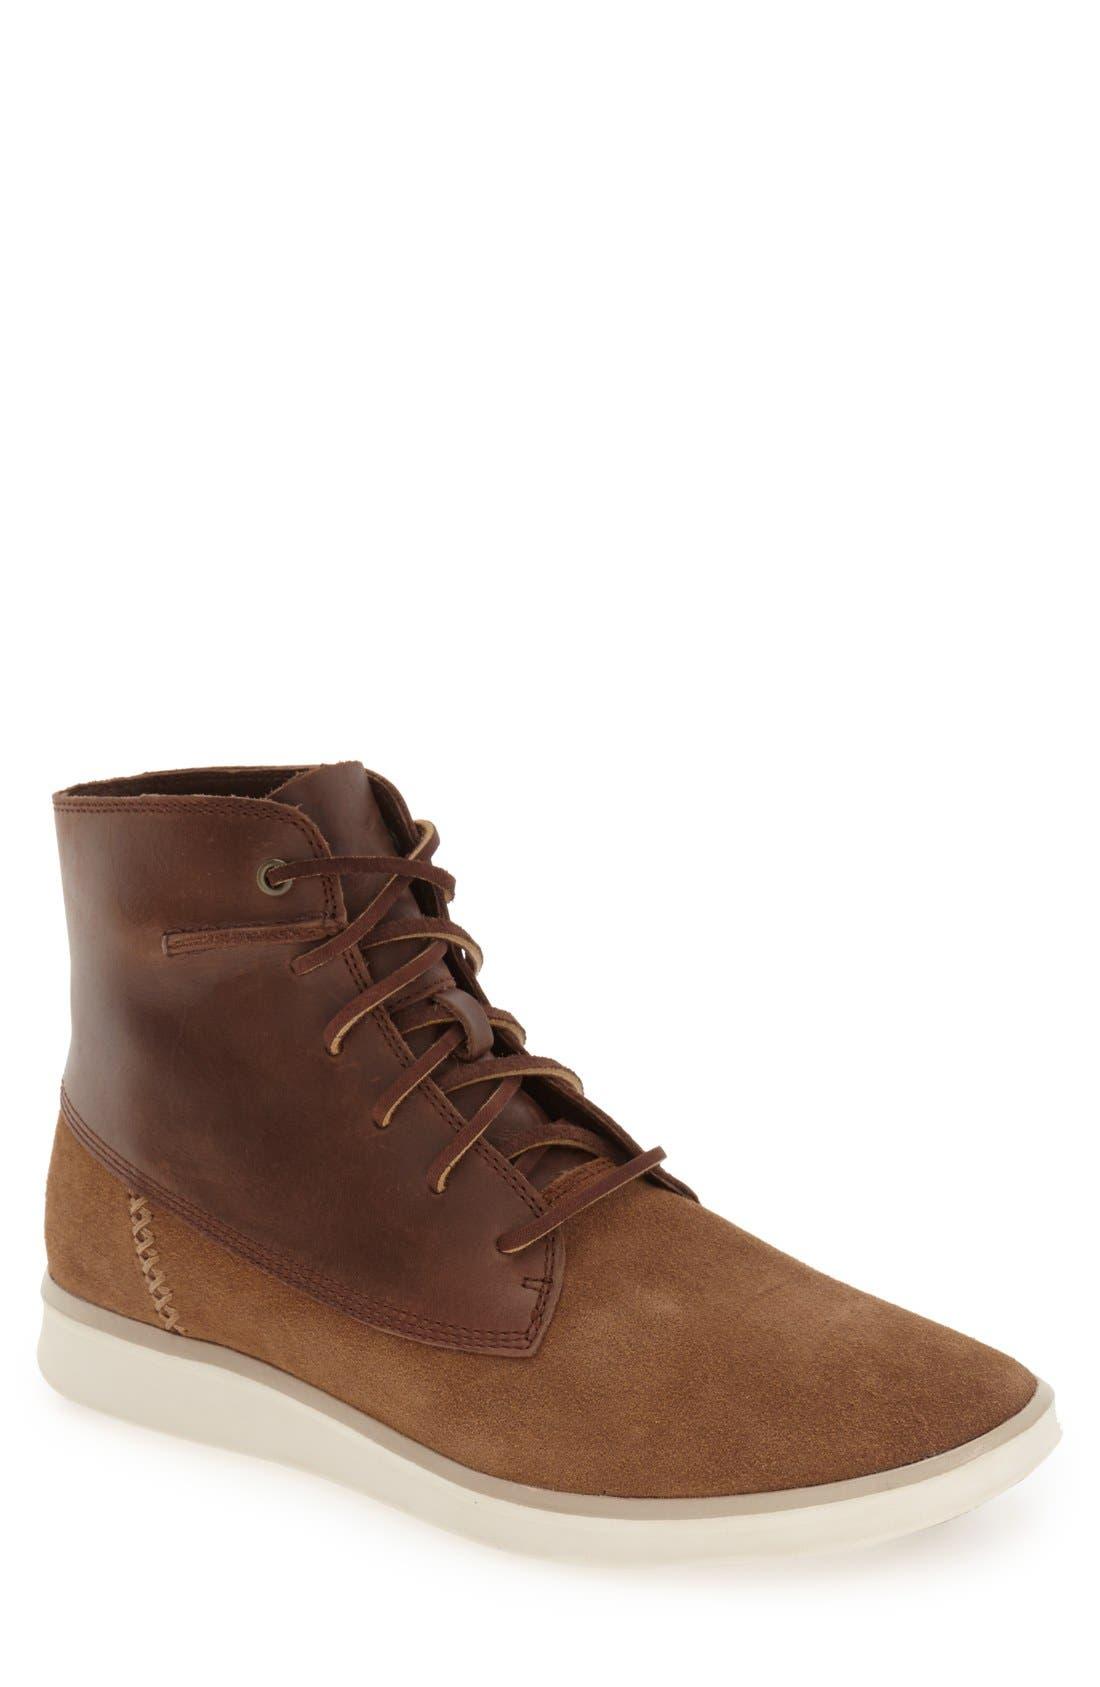 'Lamont' High Top Sneaker,                         Main,                         color,